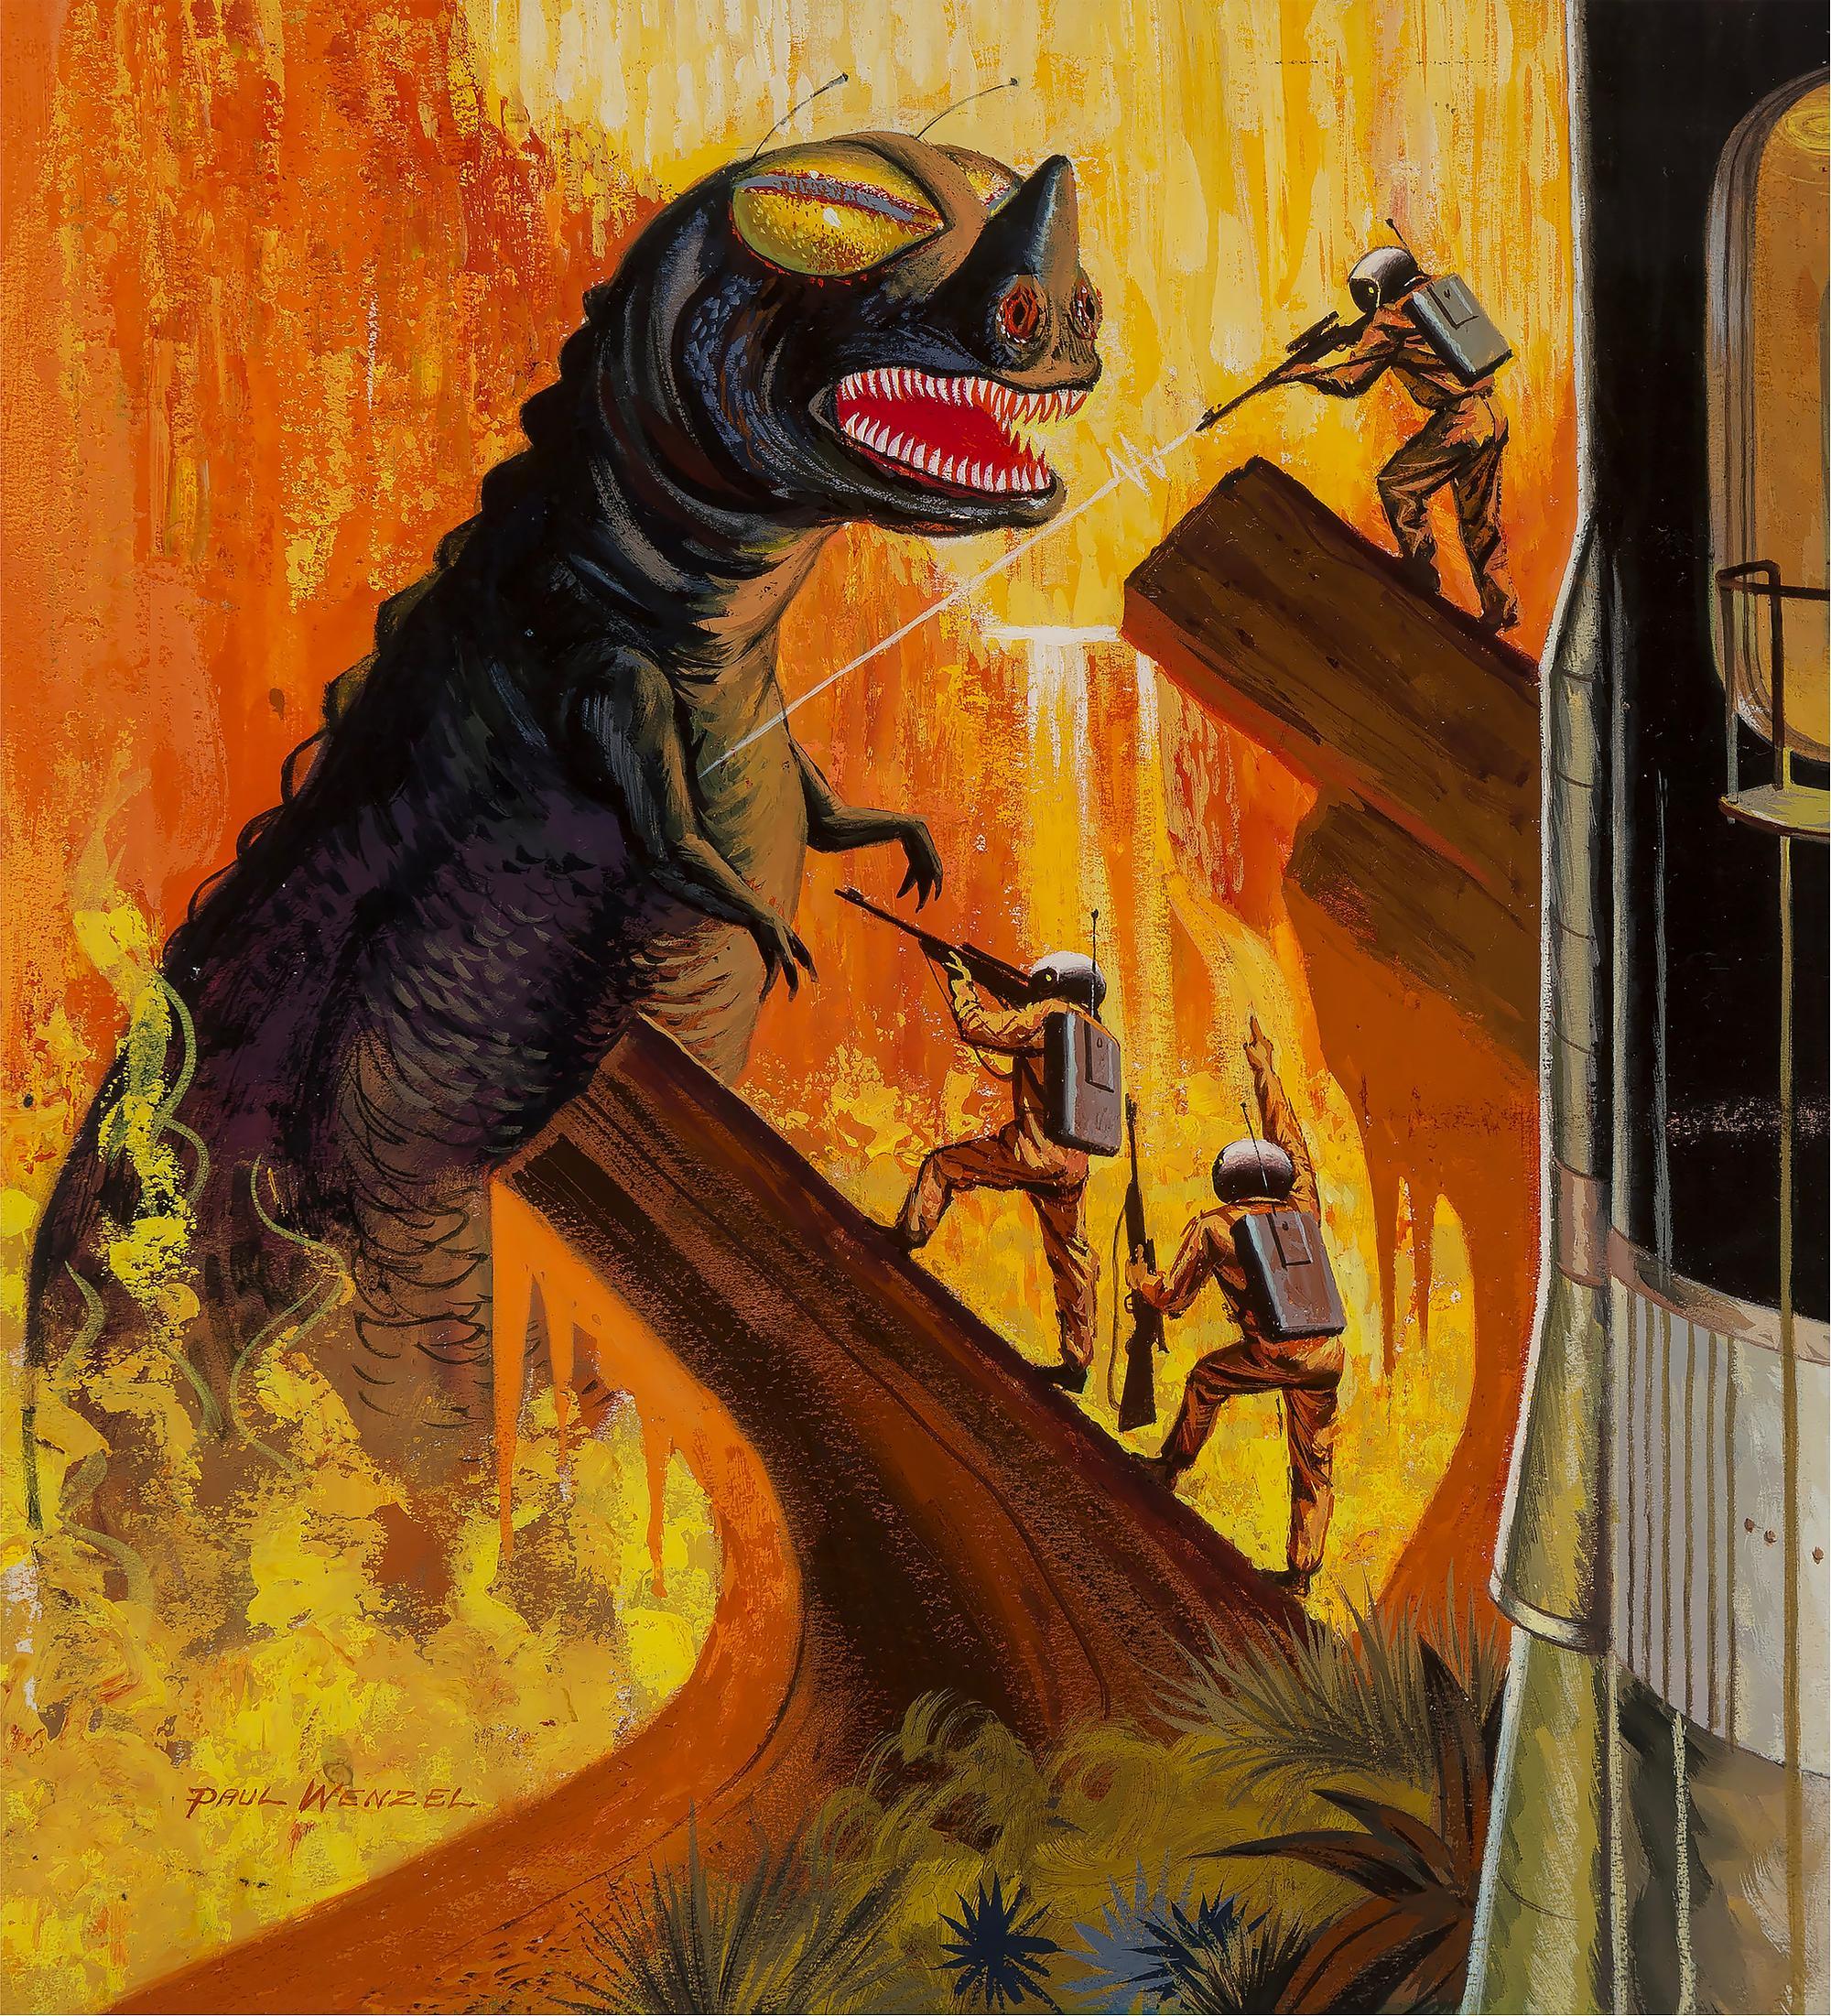 Godzilla like Dinosaur Monster, SciFi, Science Fiction Cover Illustration